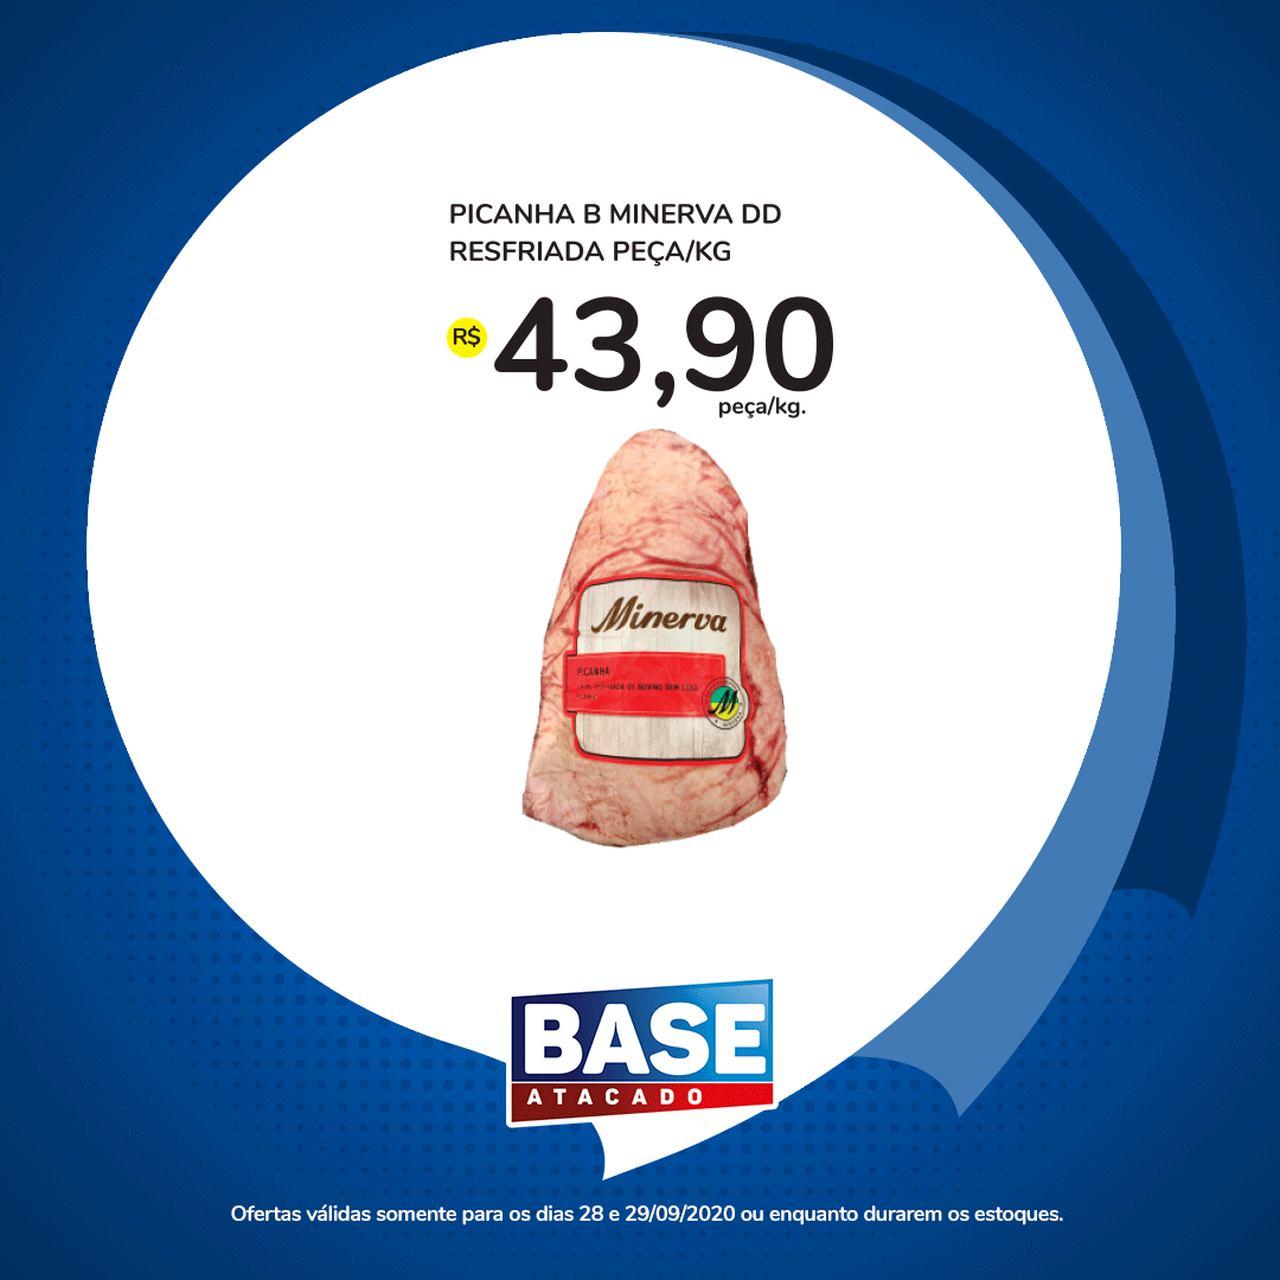 Ofertas de supermercado BASE atacado segunda e terça de super ofertas vence 29-09-7